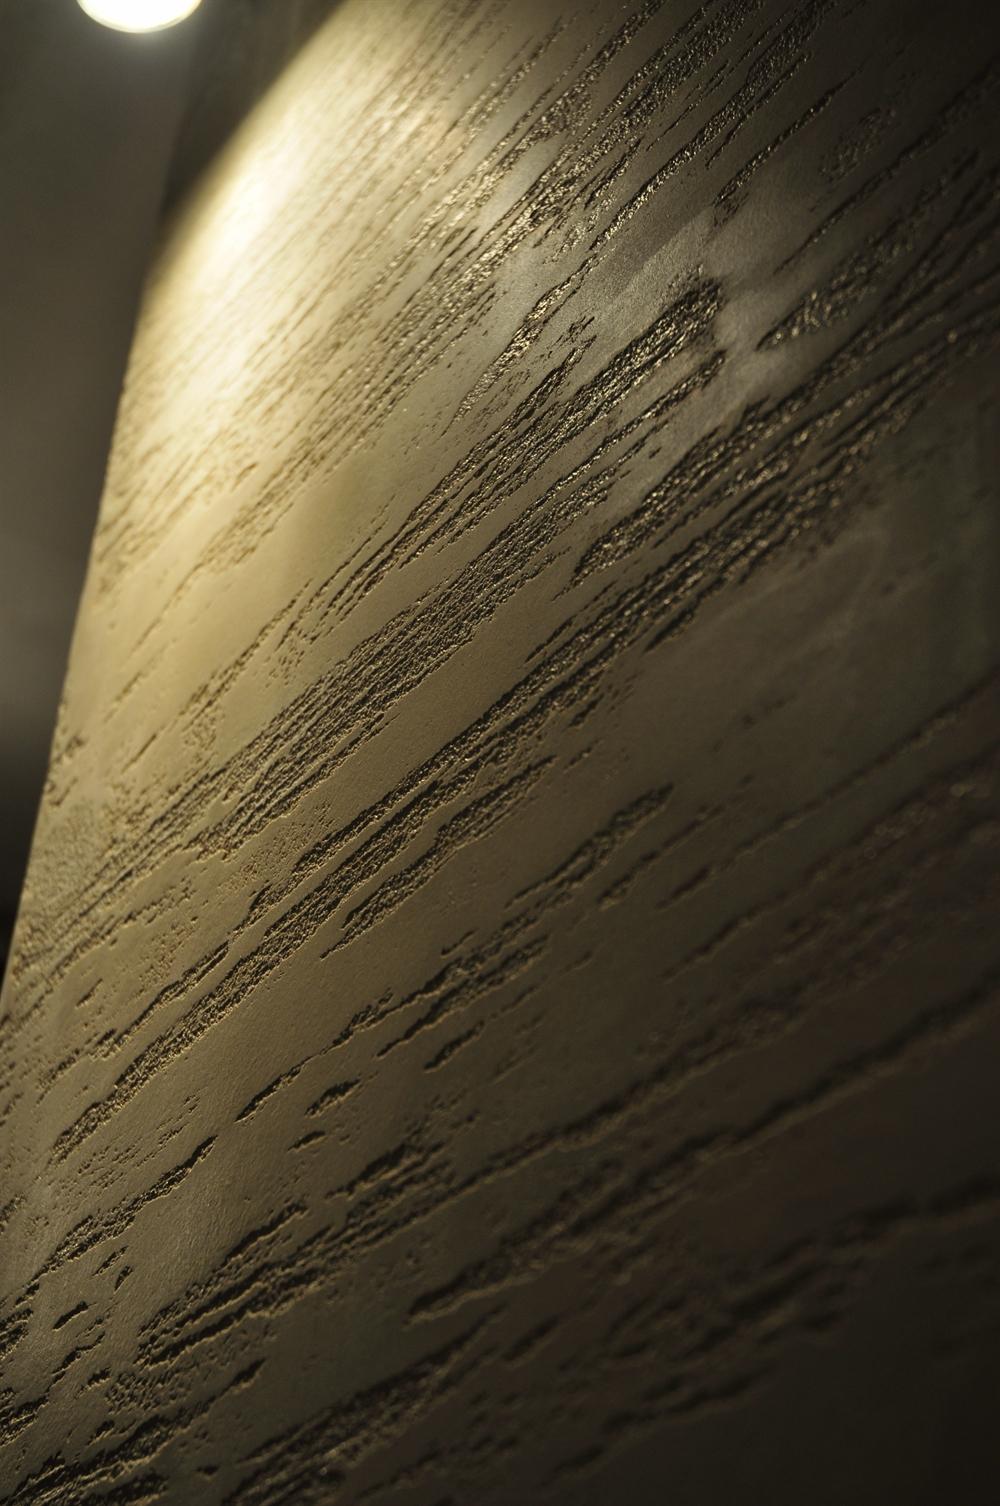 12 Travertine candis  benjamin moore wall efects painting malowanie scian faktura interior design apartment renovating malowanie mieszkania remont